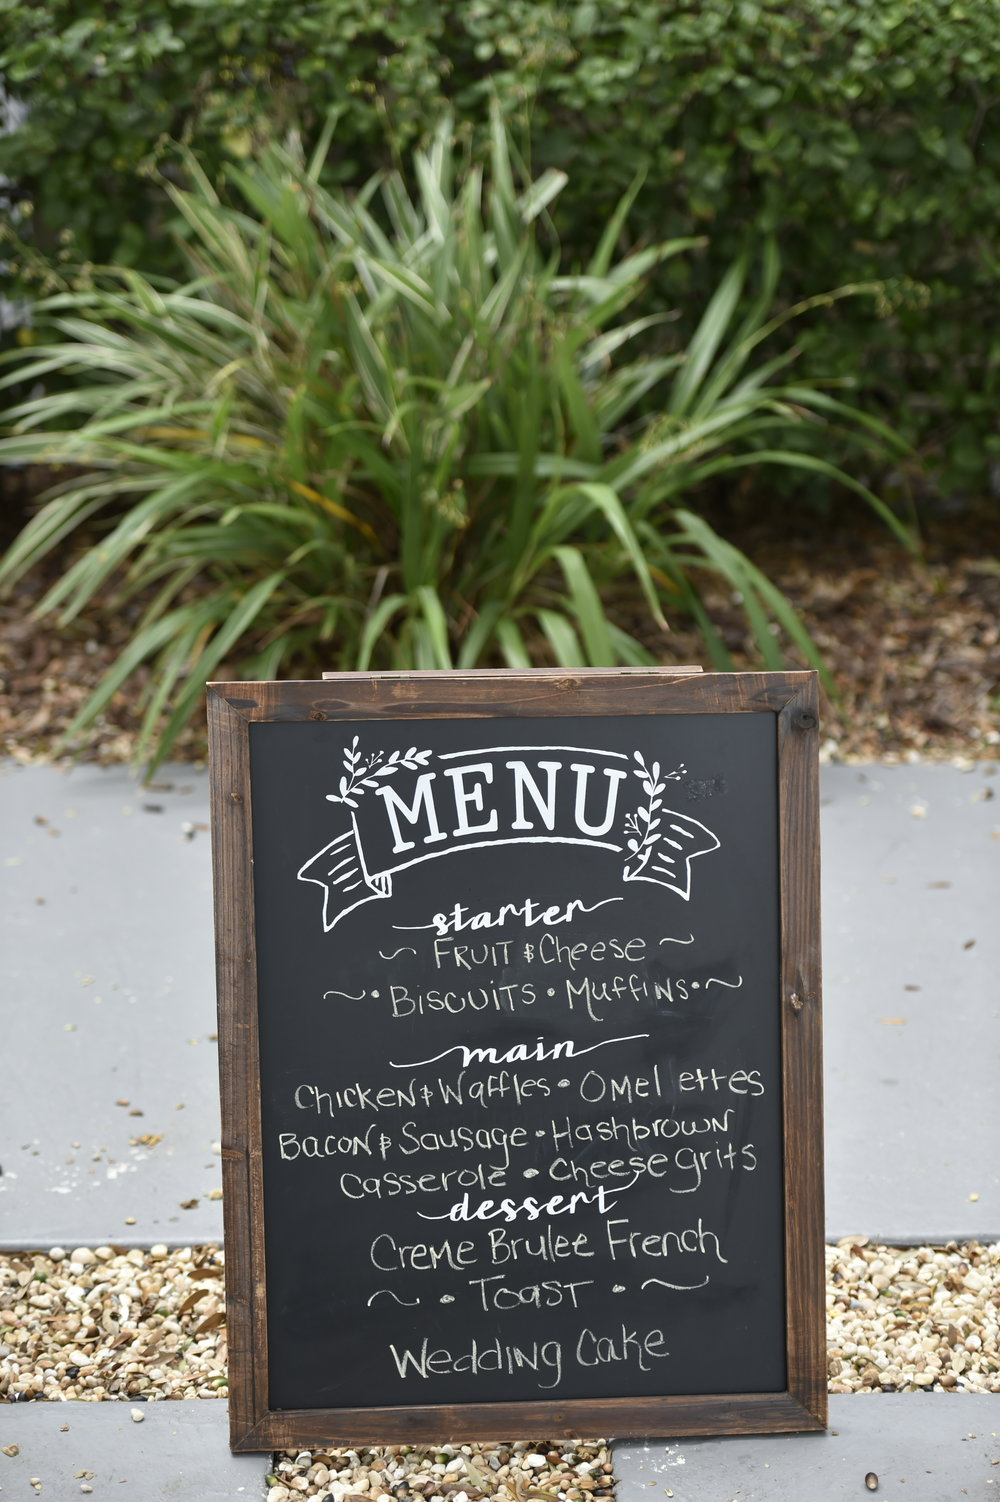 A hand written chalkboard sign displayed the brunch menu.